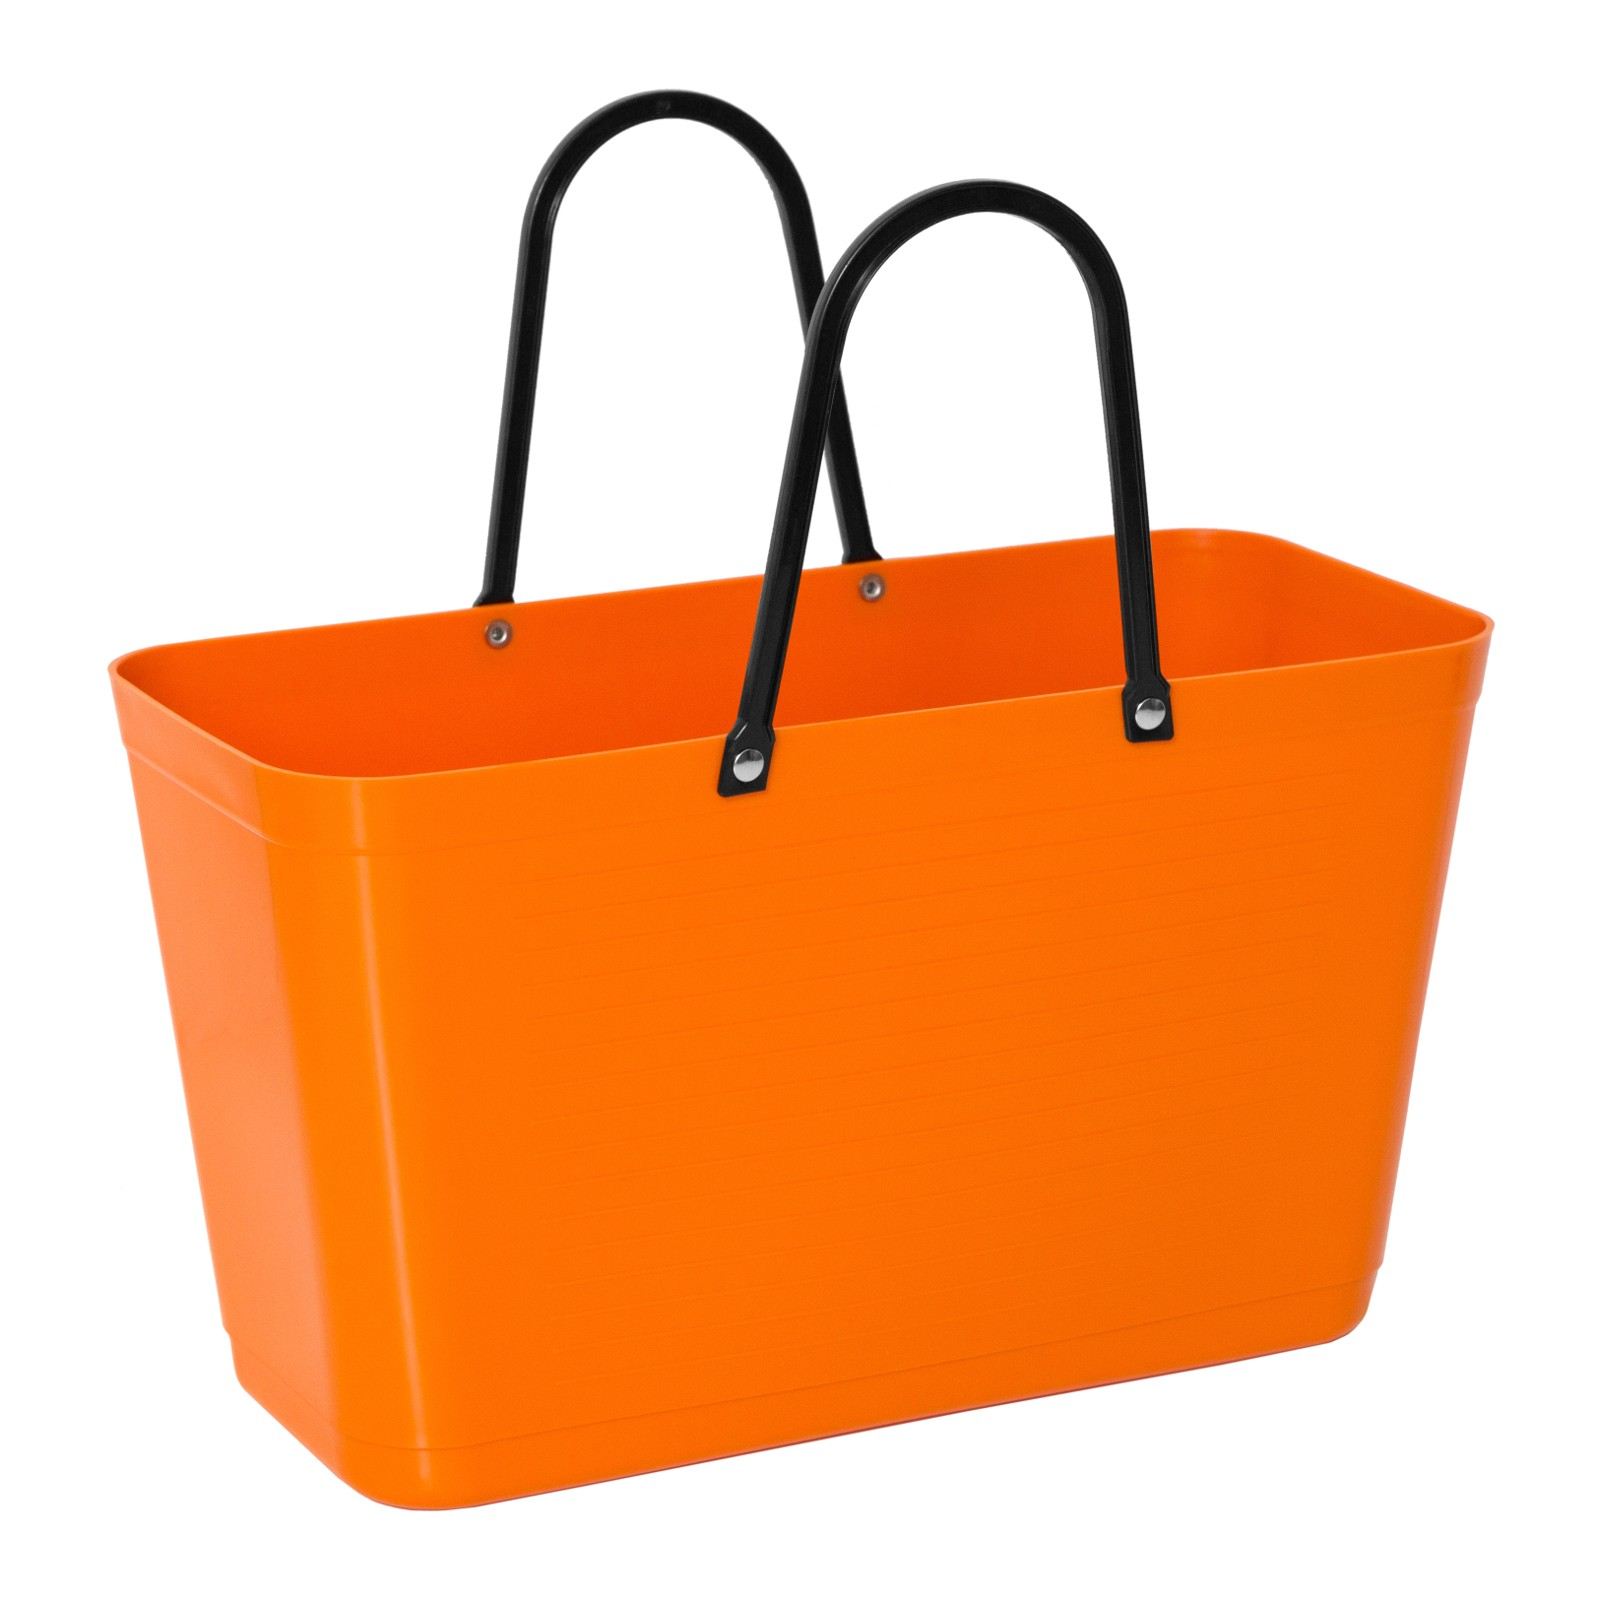 hinza 024-hinza-bag-large-orange